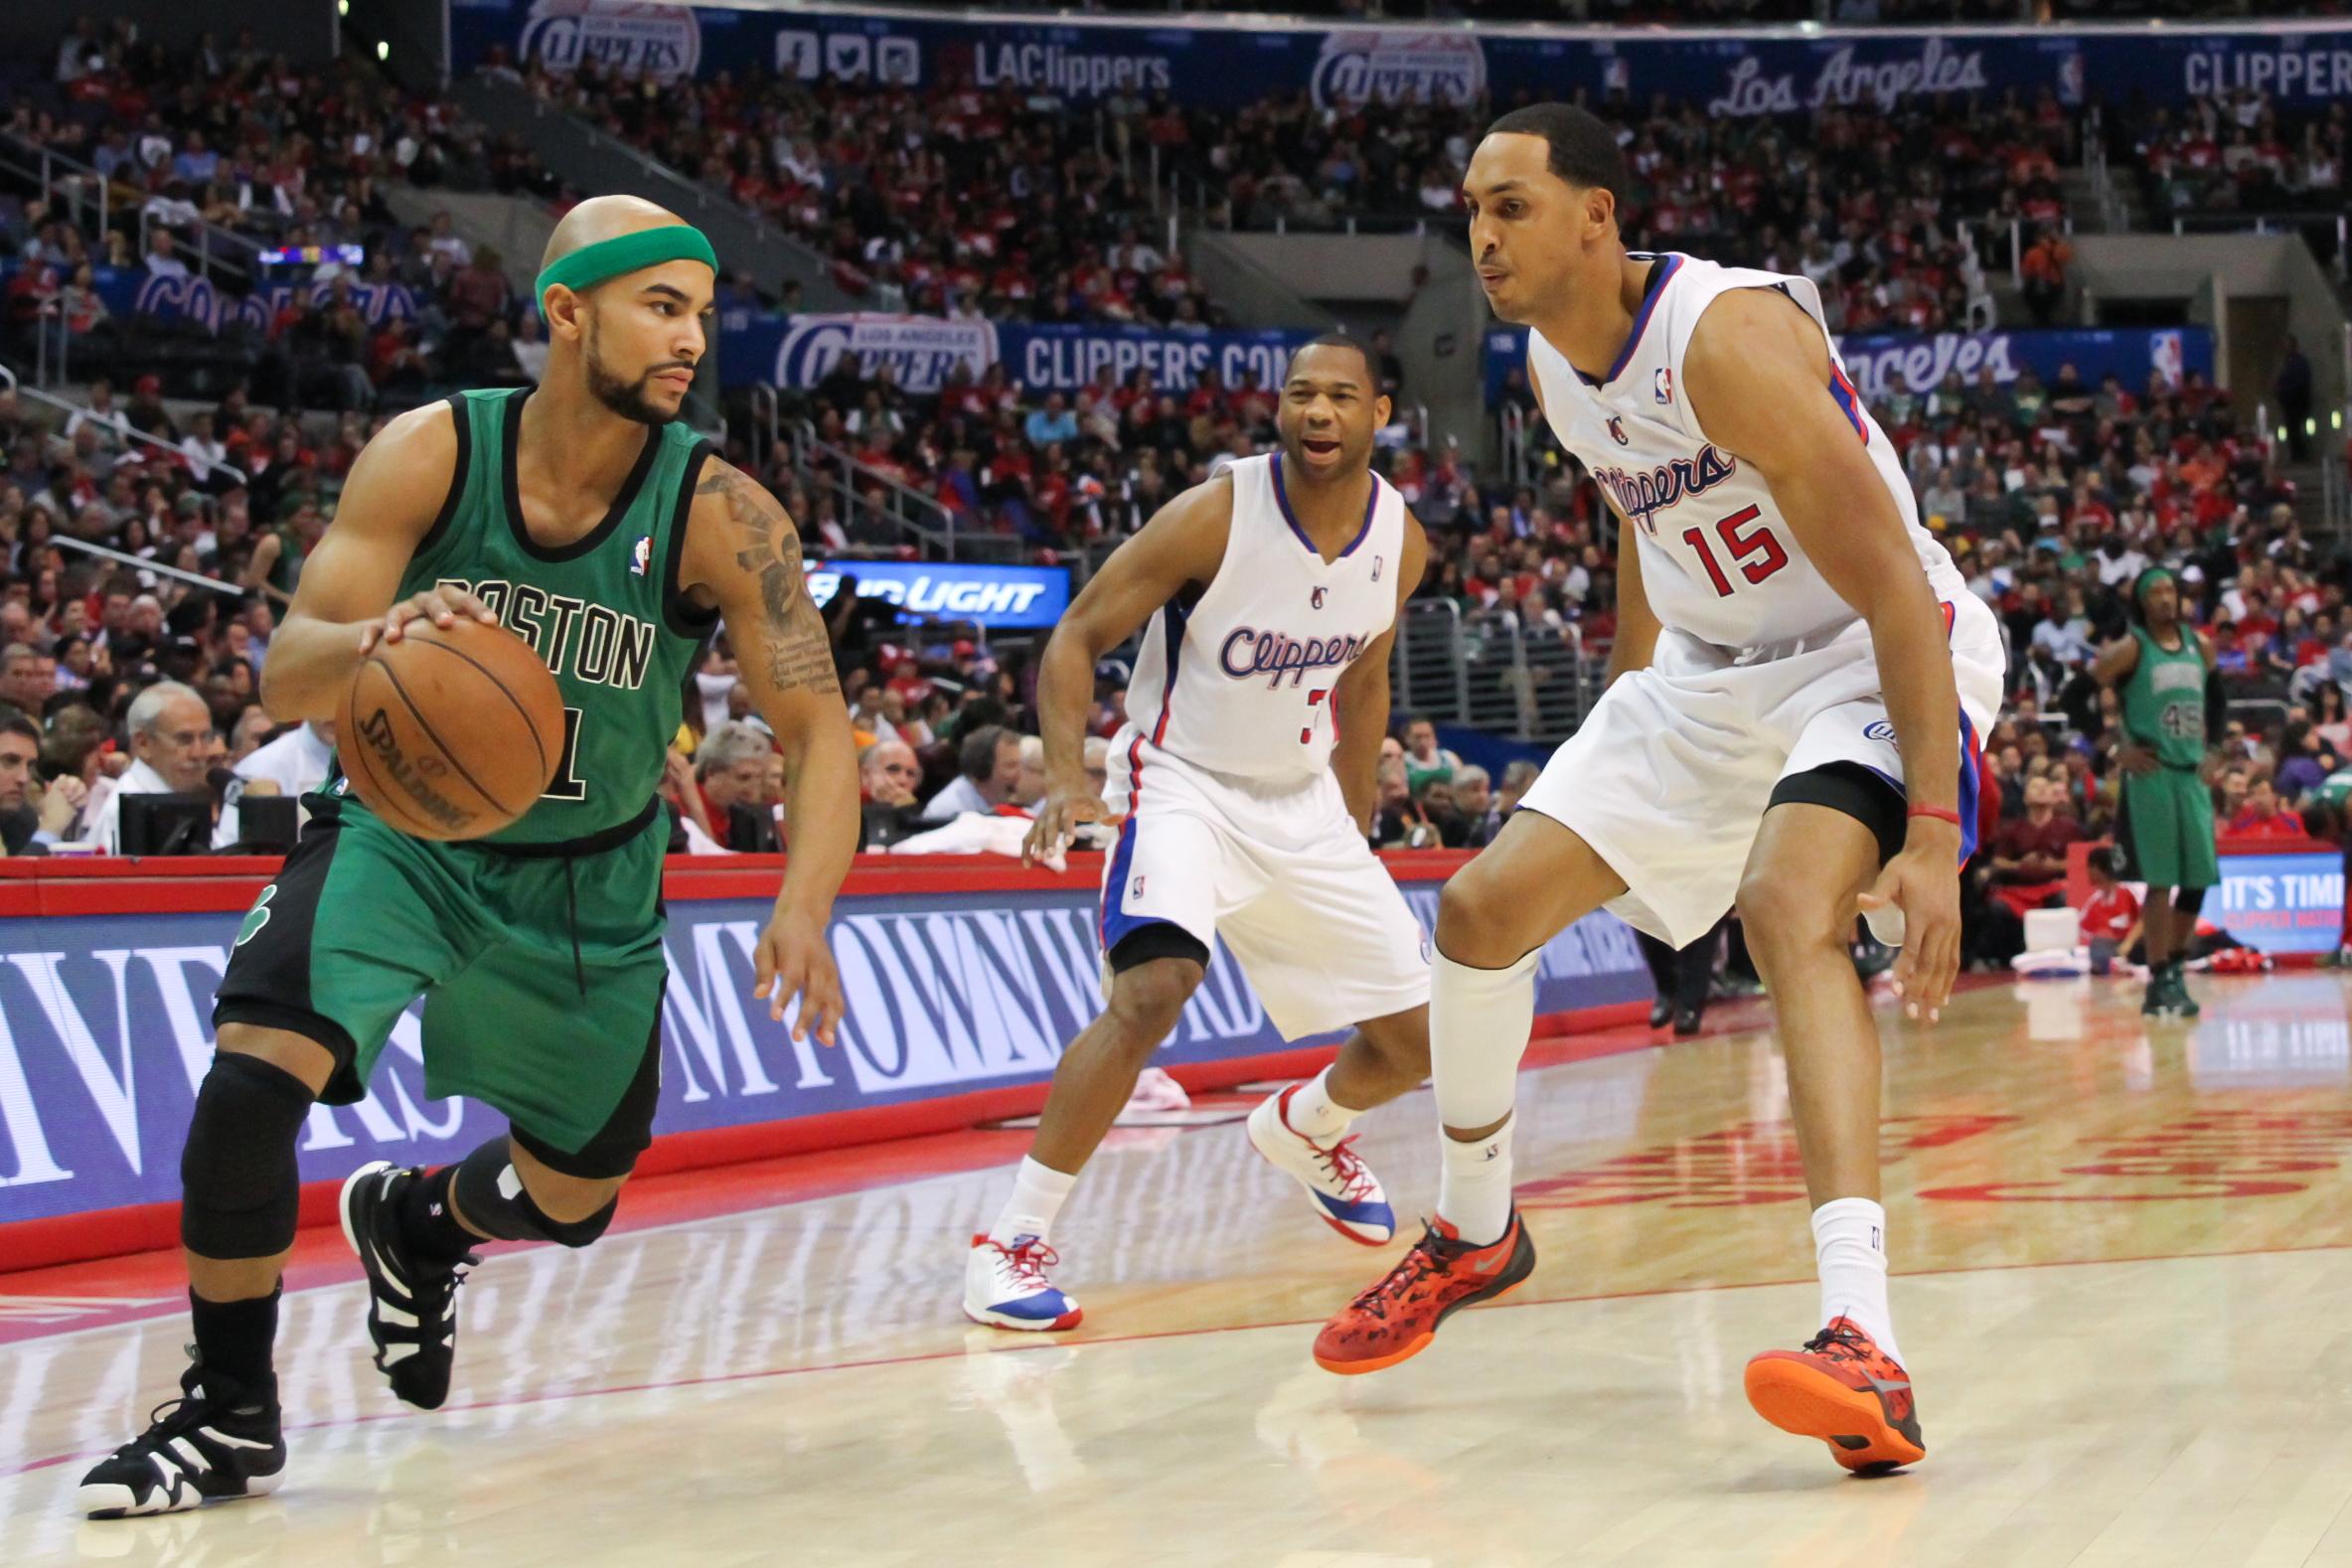 Photo by Varon P. Celtics-23.jpg